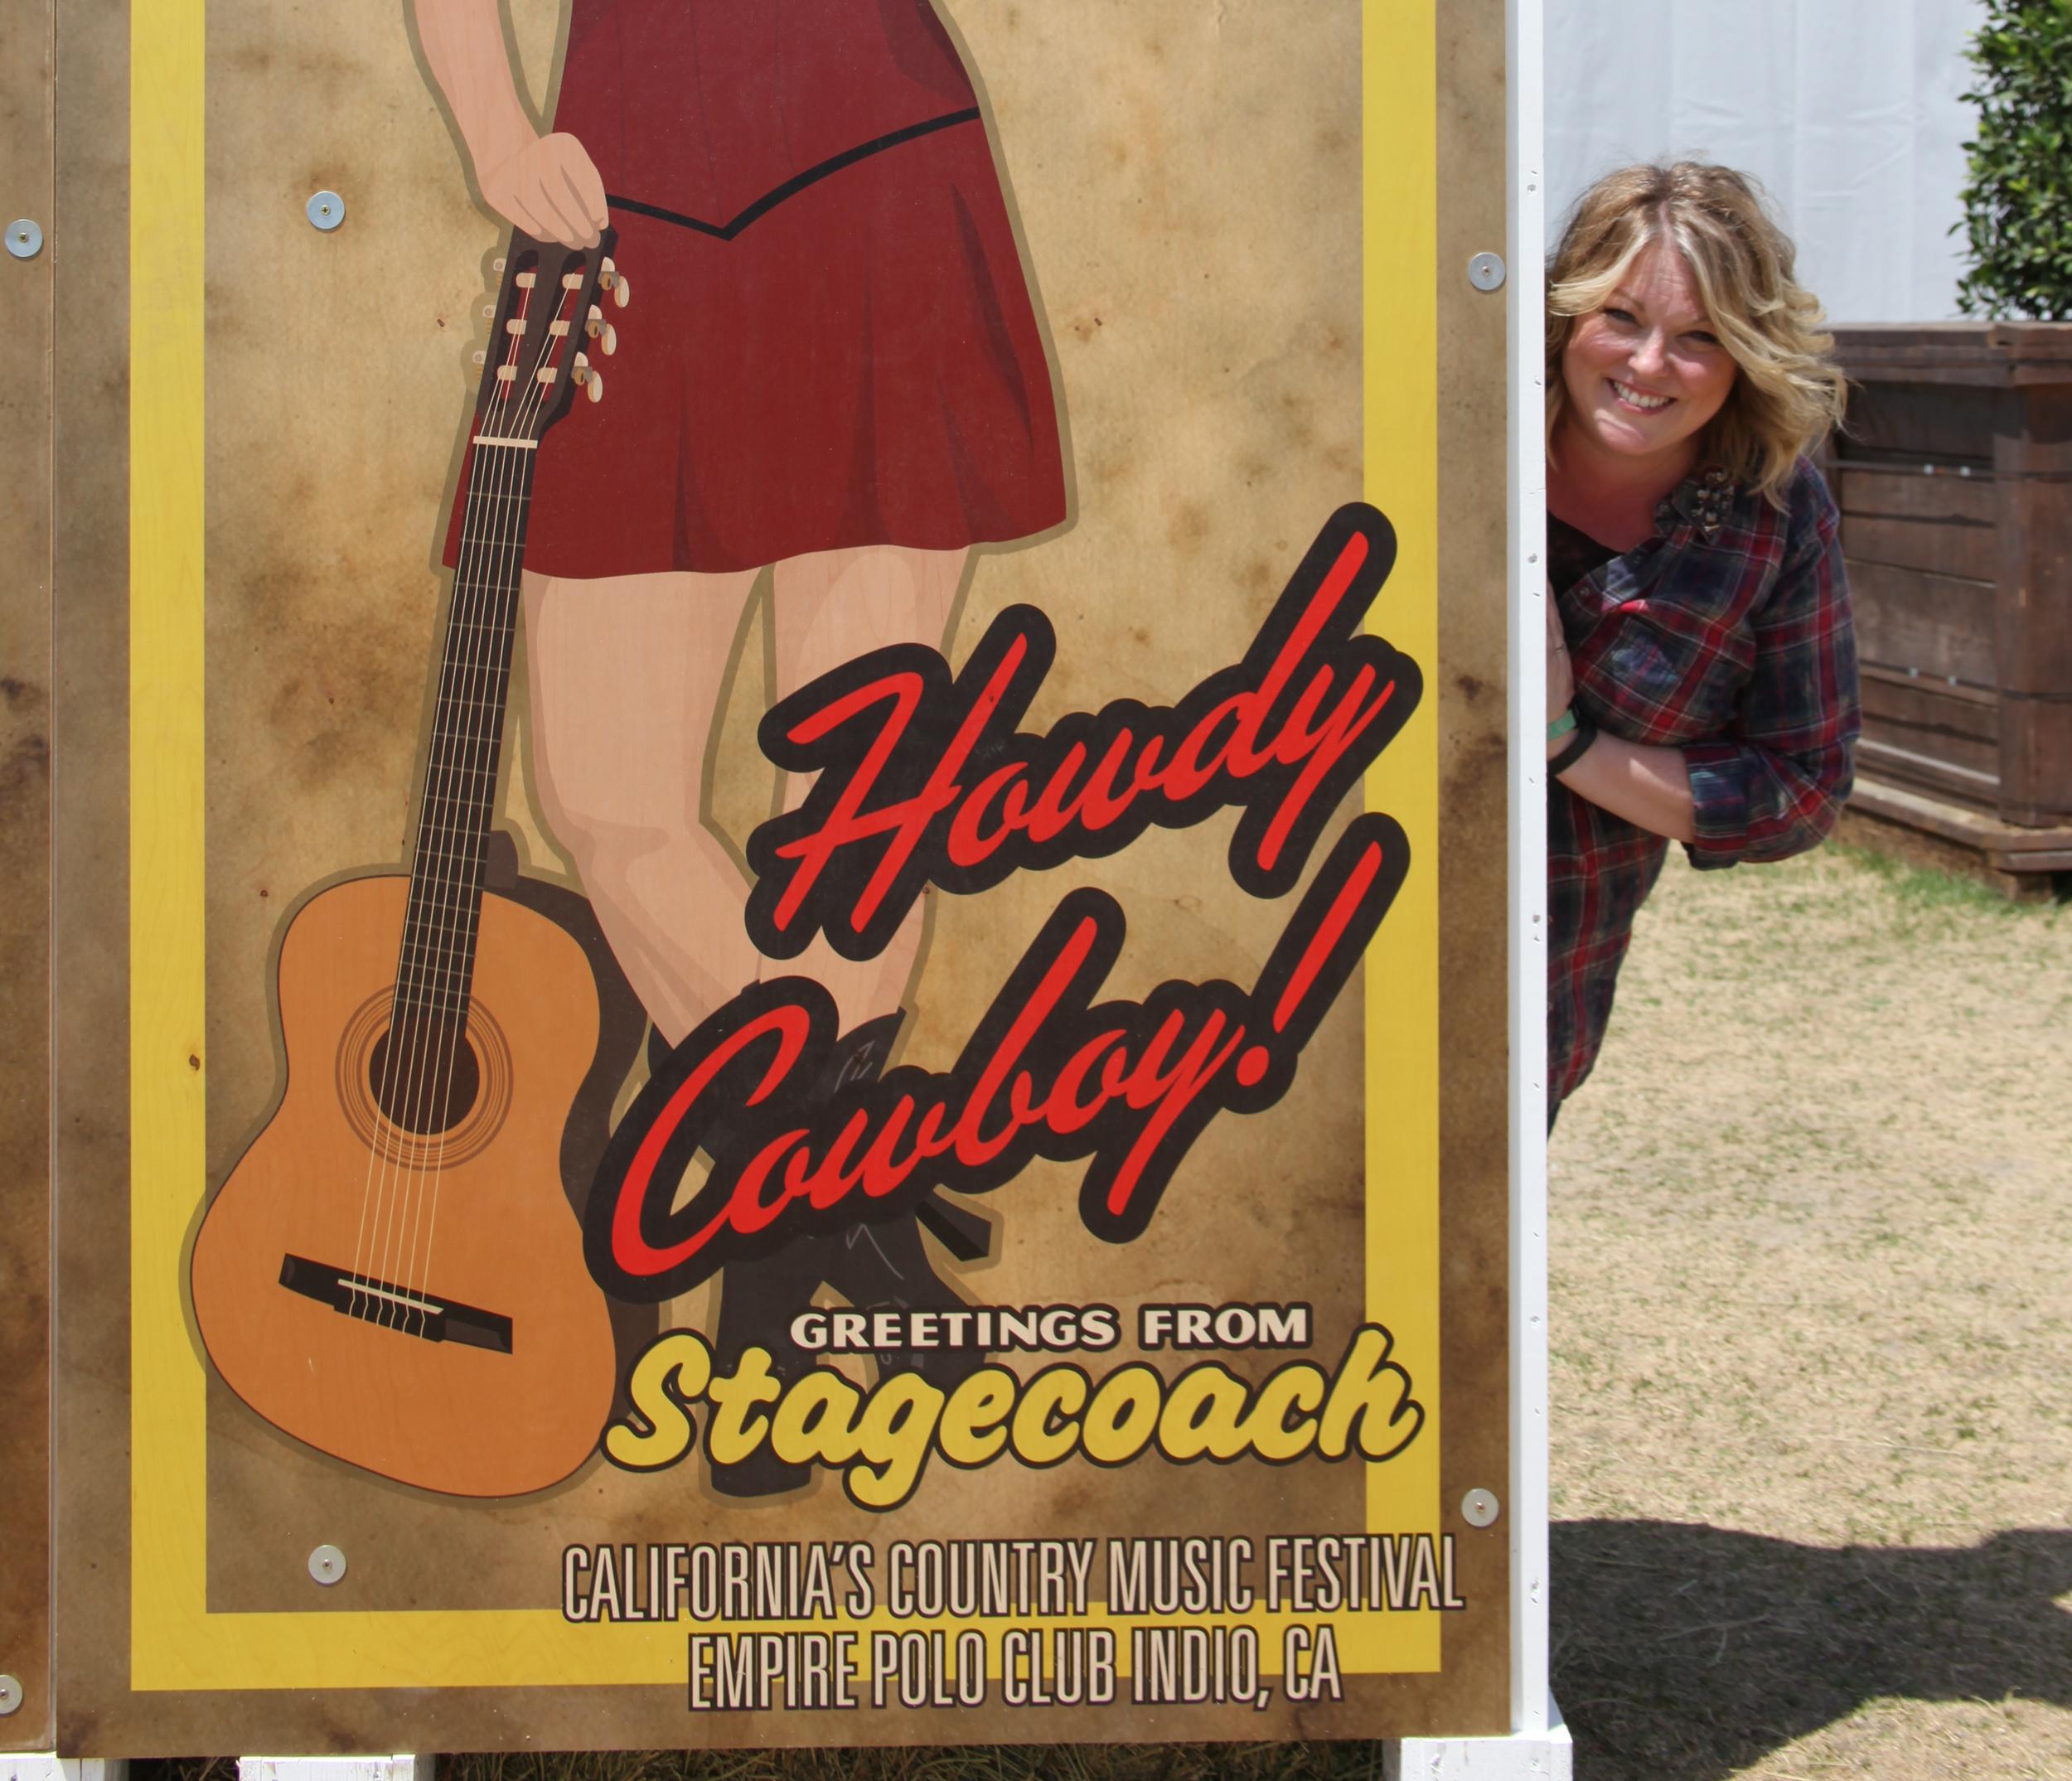 COACHELLA & Stagecoach music festivaLS